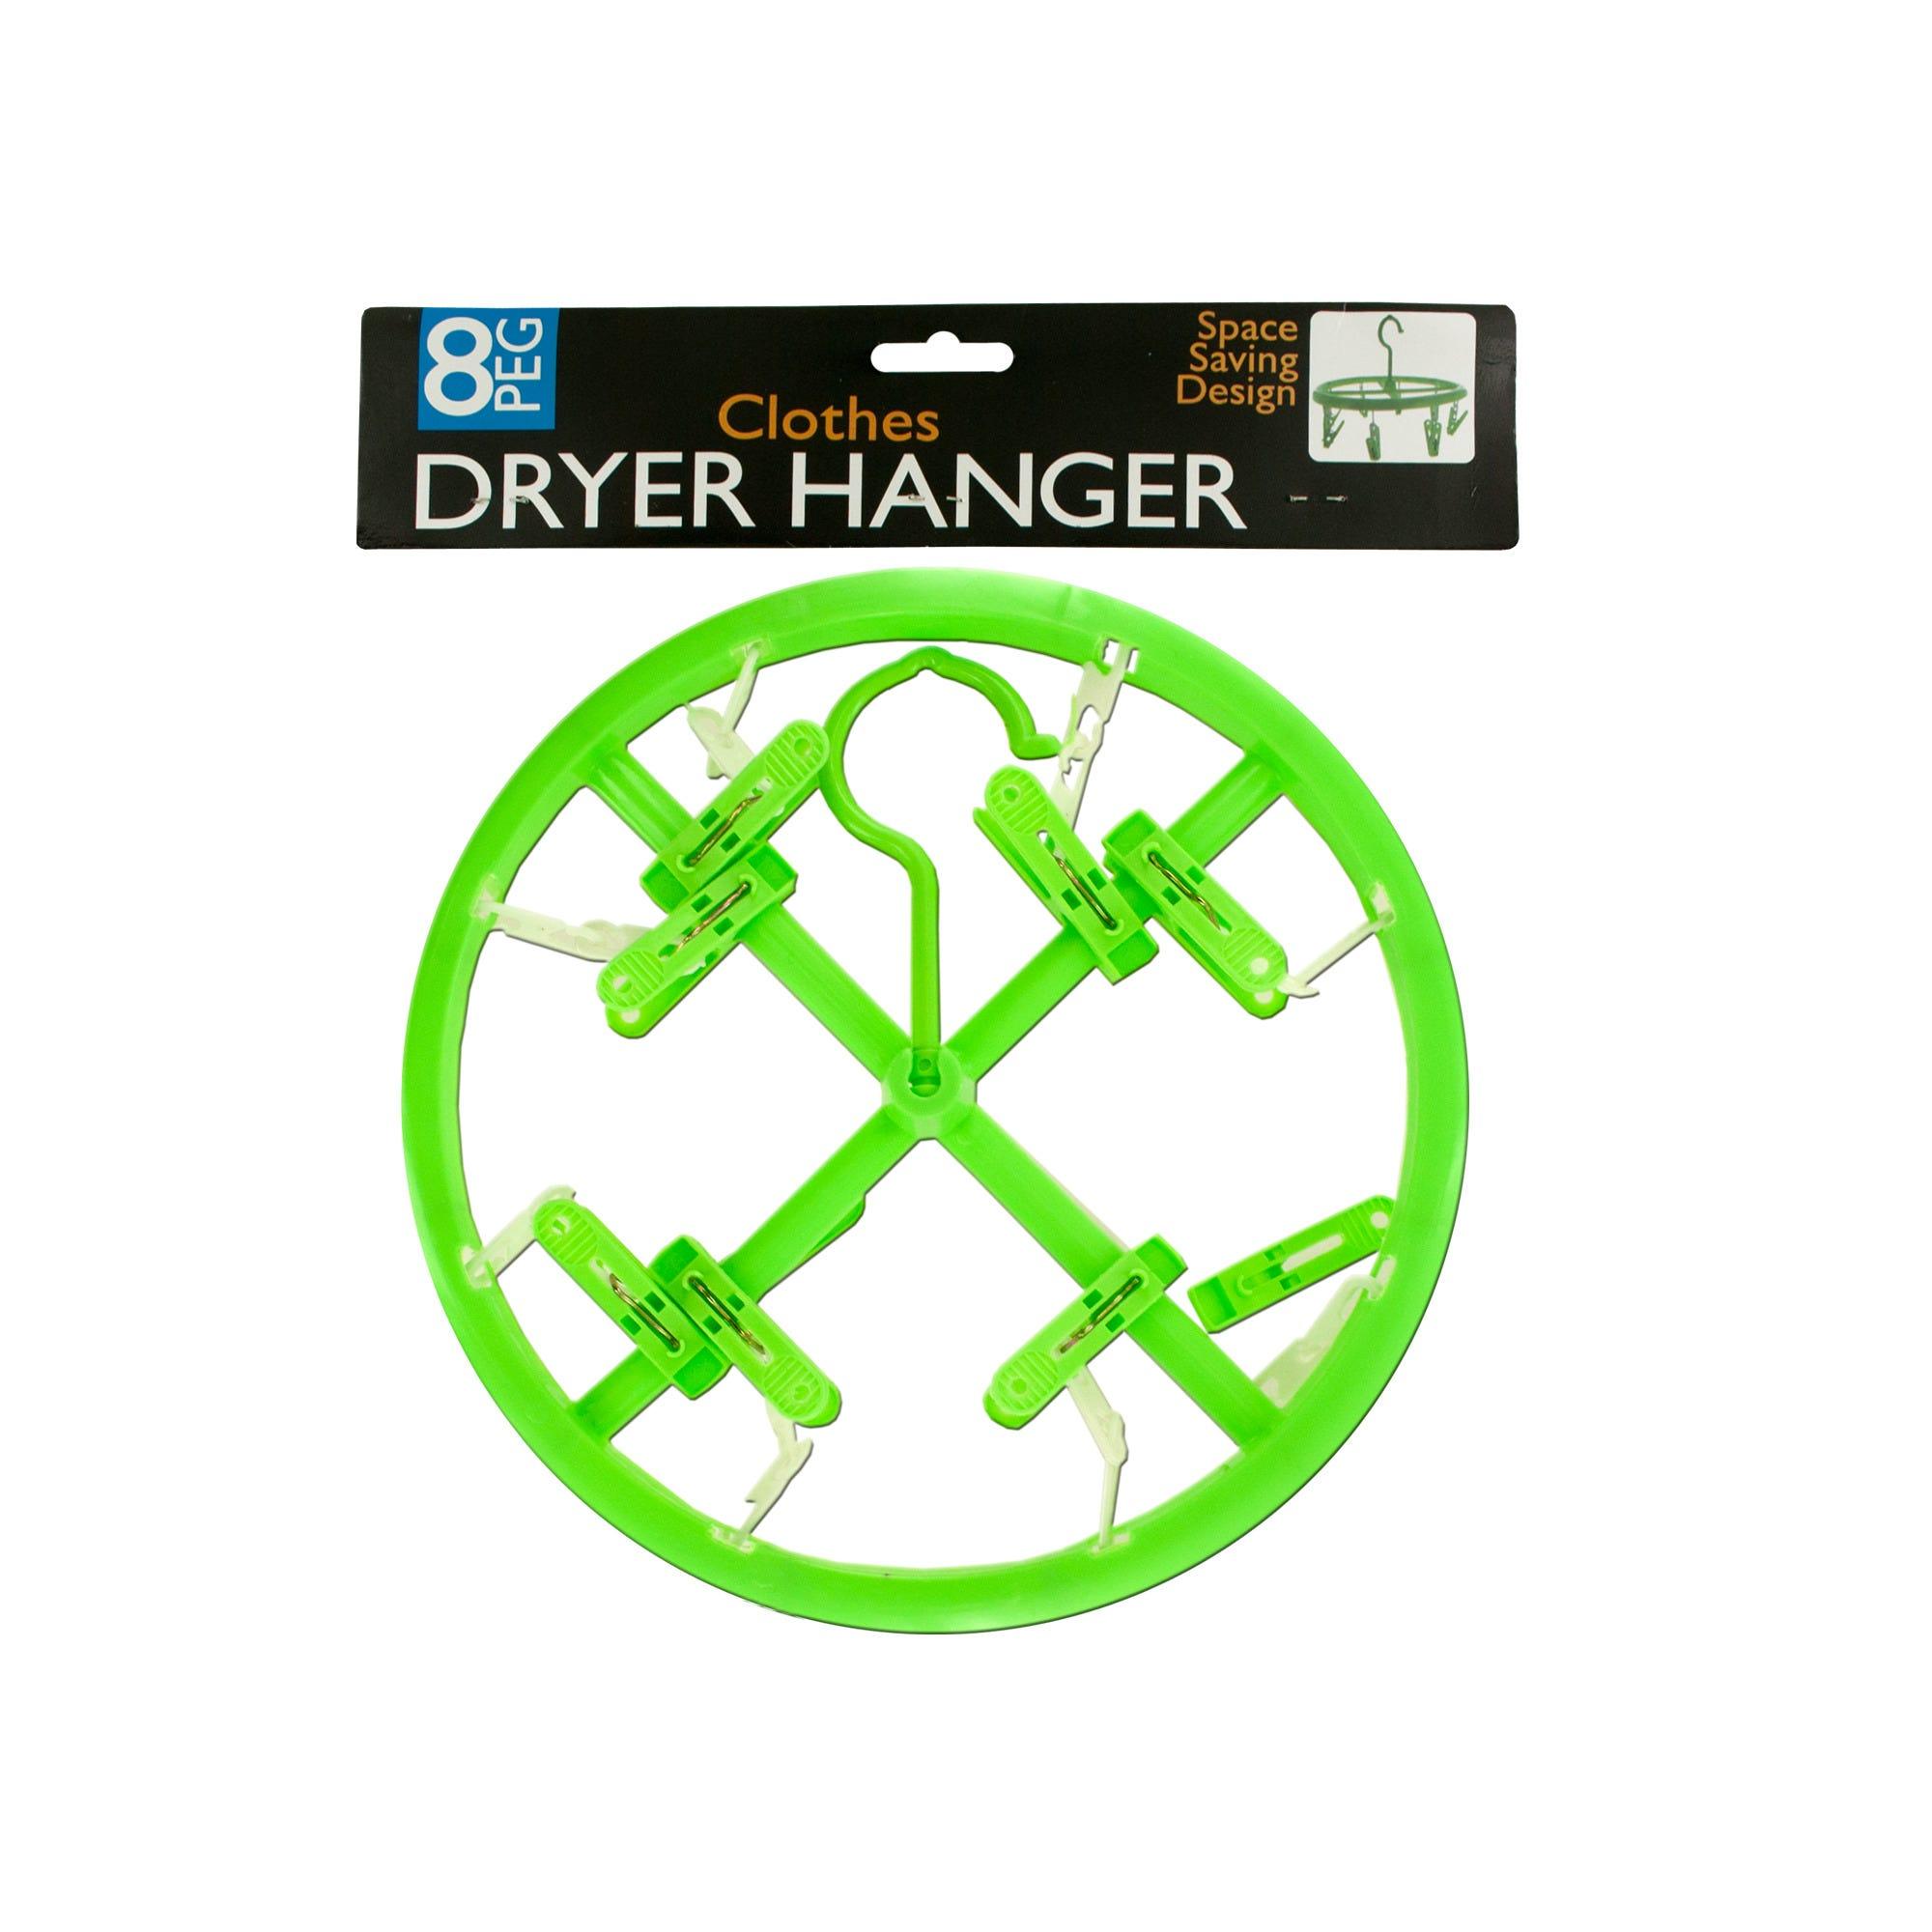 8-clip-CLOTHING-dryer-hanger